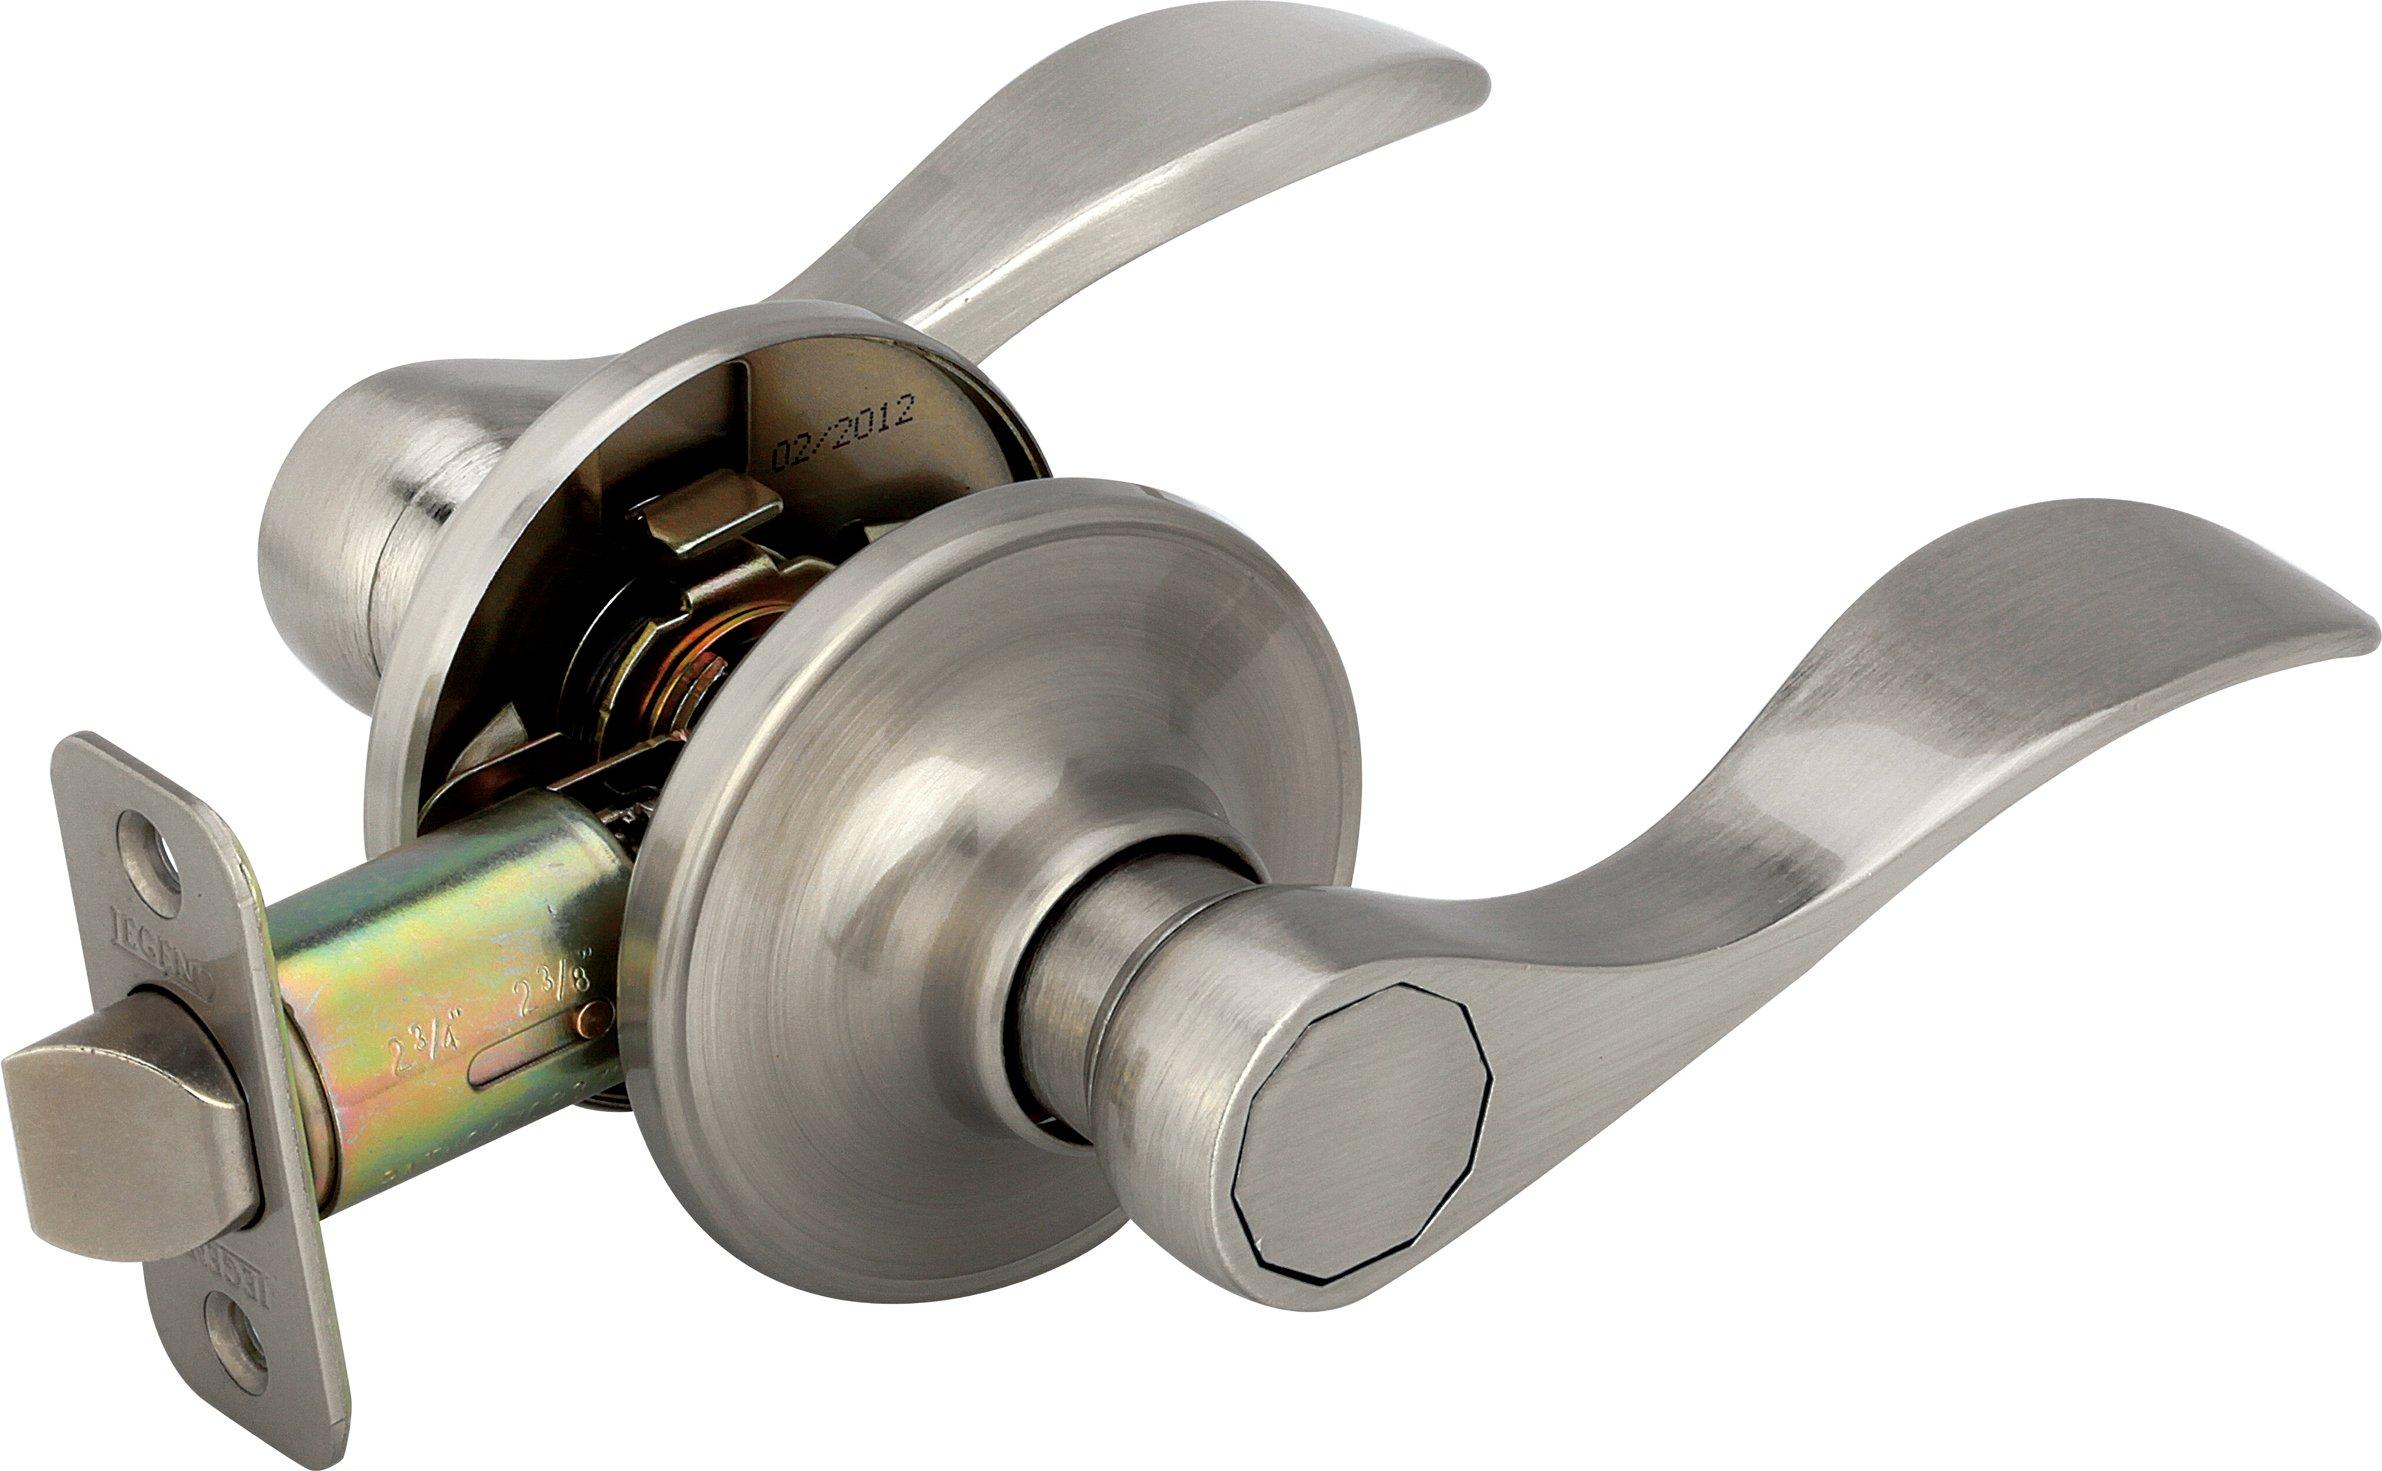 Legend 809124 Wave Style Lever Handle Passage Hall and Closet Leverset Lockset, US15 Brushed Nickel Finish